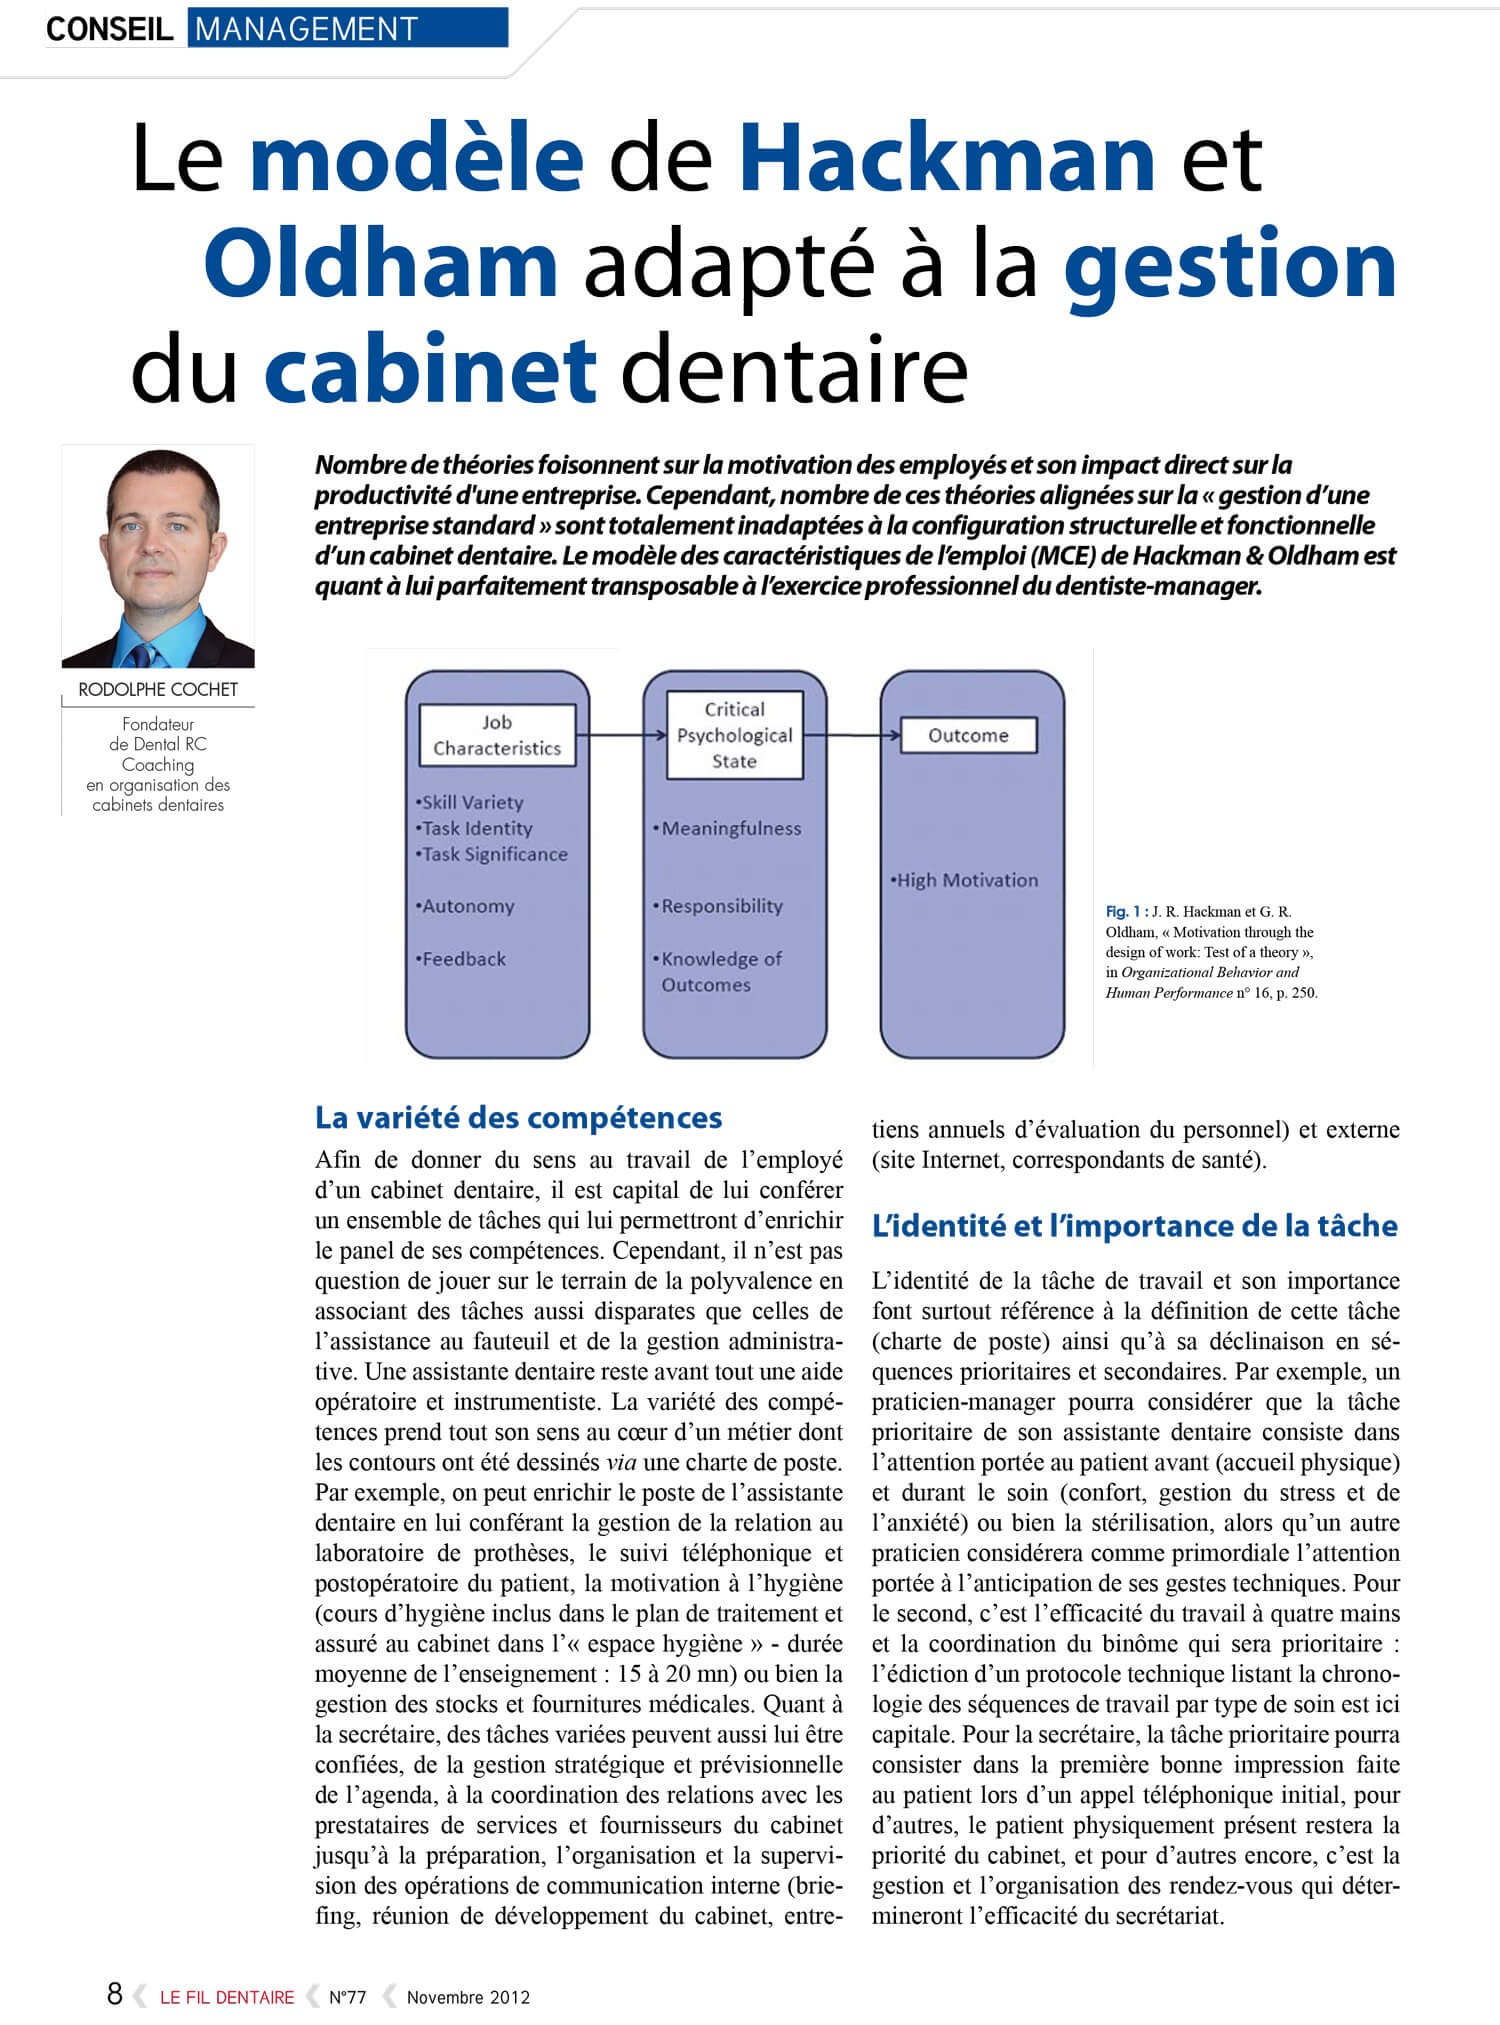 modele-hackman-oldham-gestion-cabinet-dentaire-rodolphe-cochet.jpg